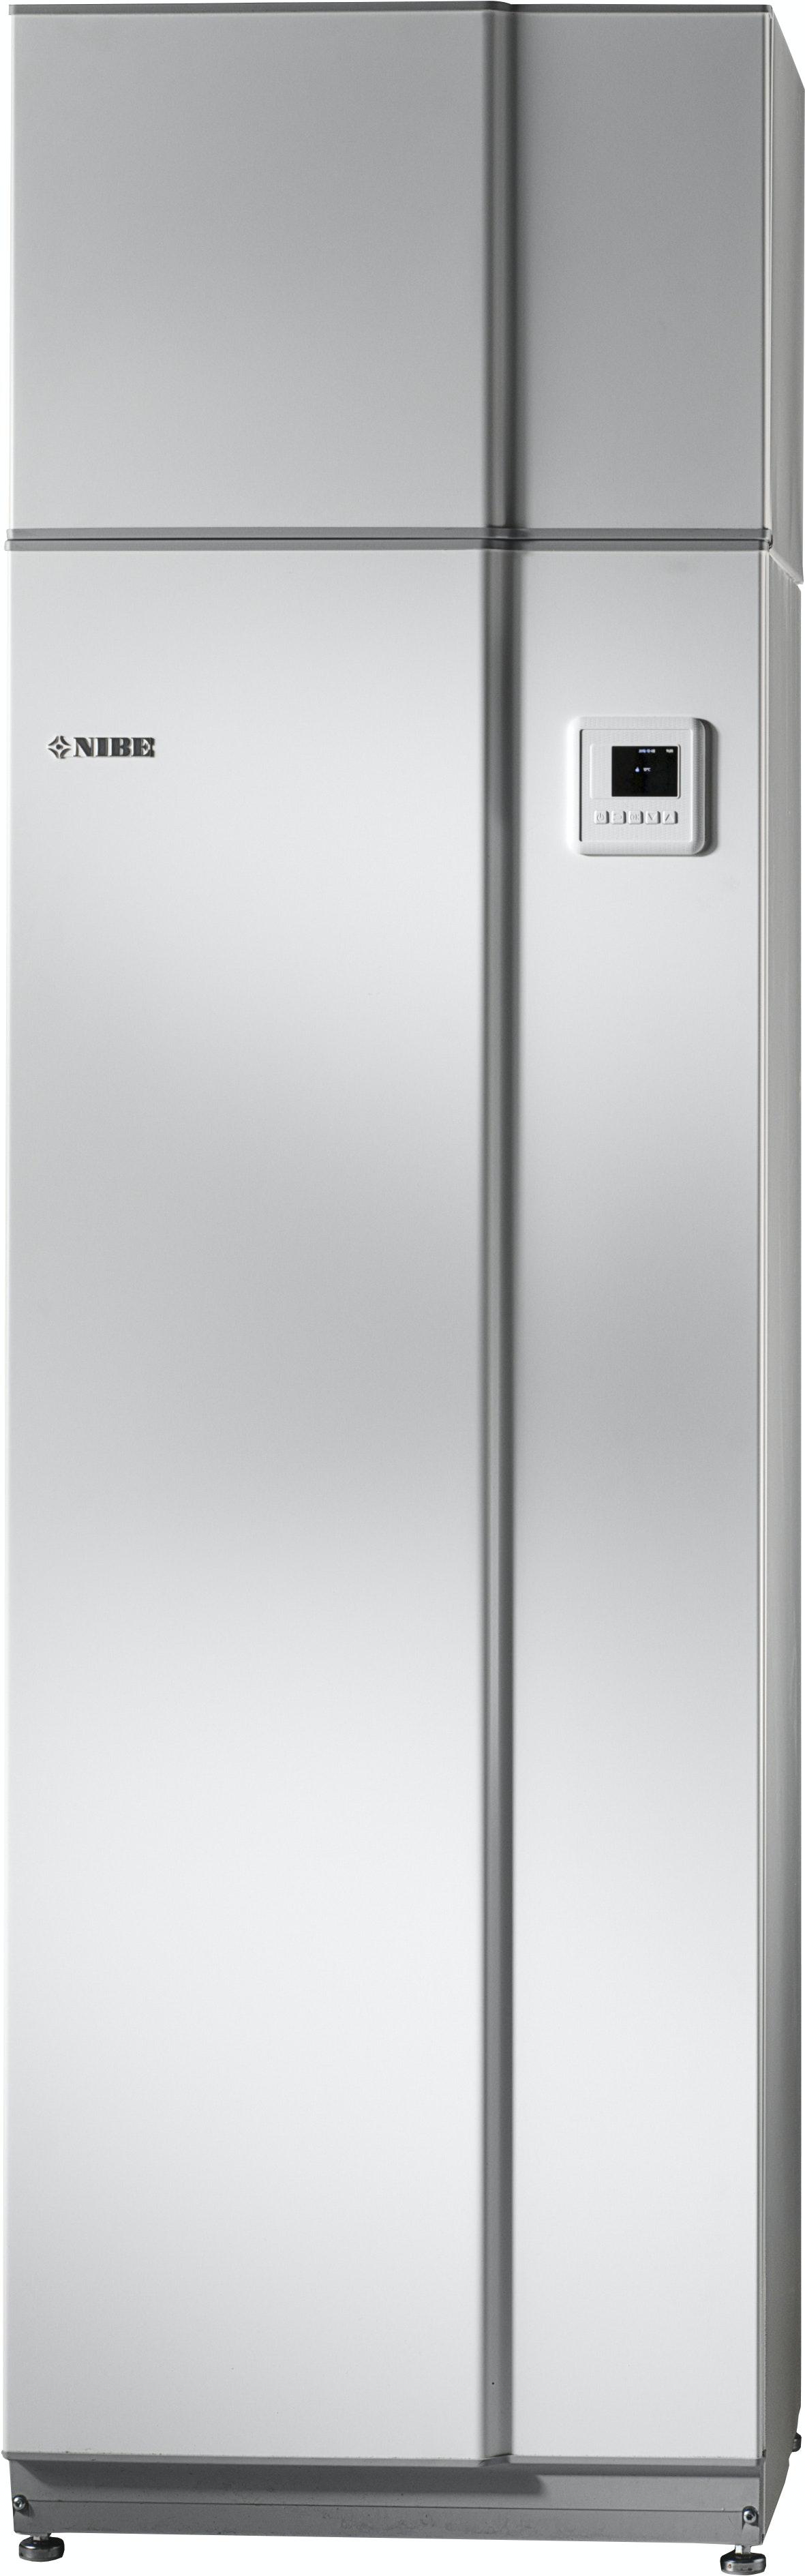 Frånluftsvärmepump Nibe F110 604x600x2071mm